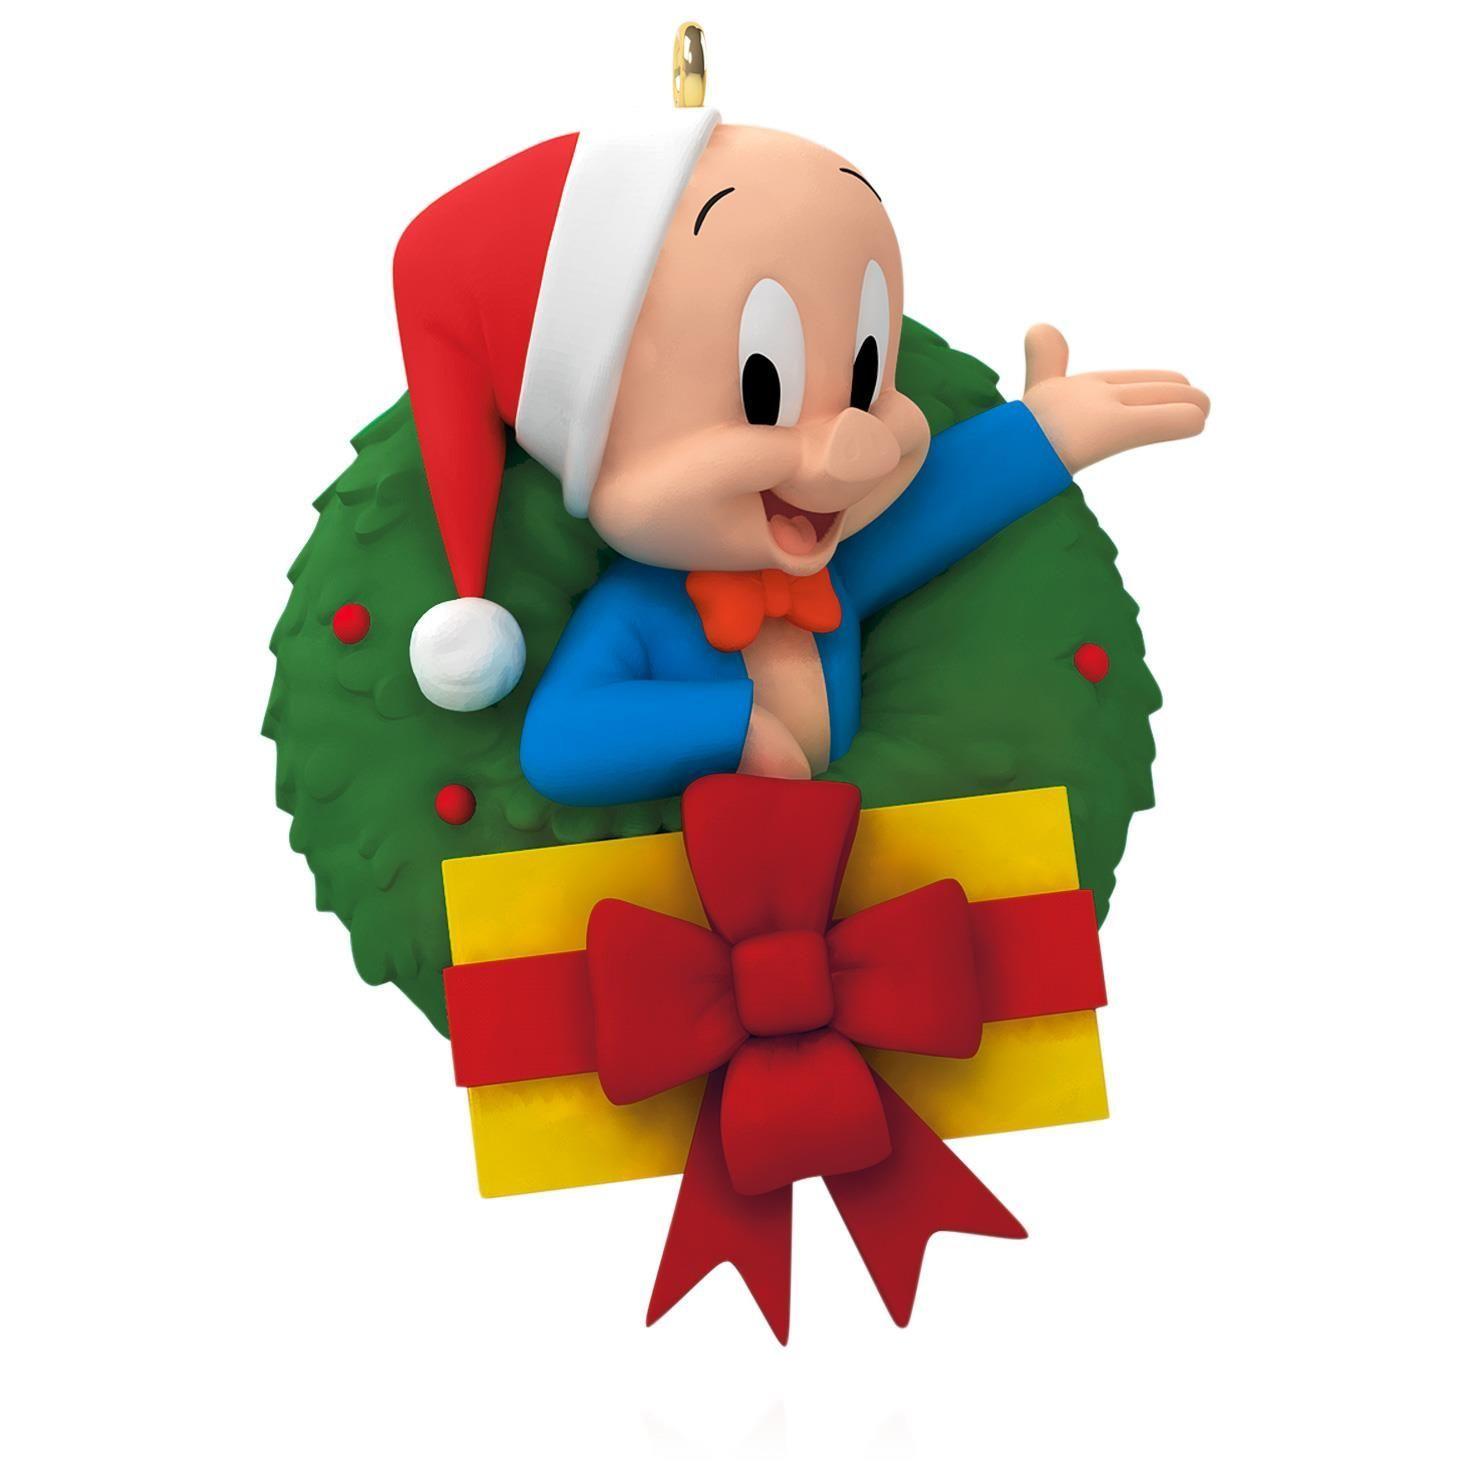 LOONEY TUNES Merry Christmas, Folks! Porky Pig Wreath Ornament ...